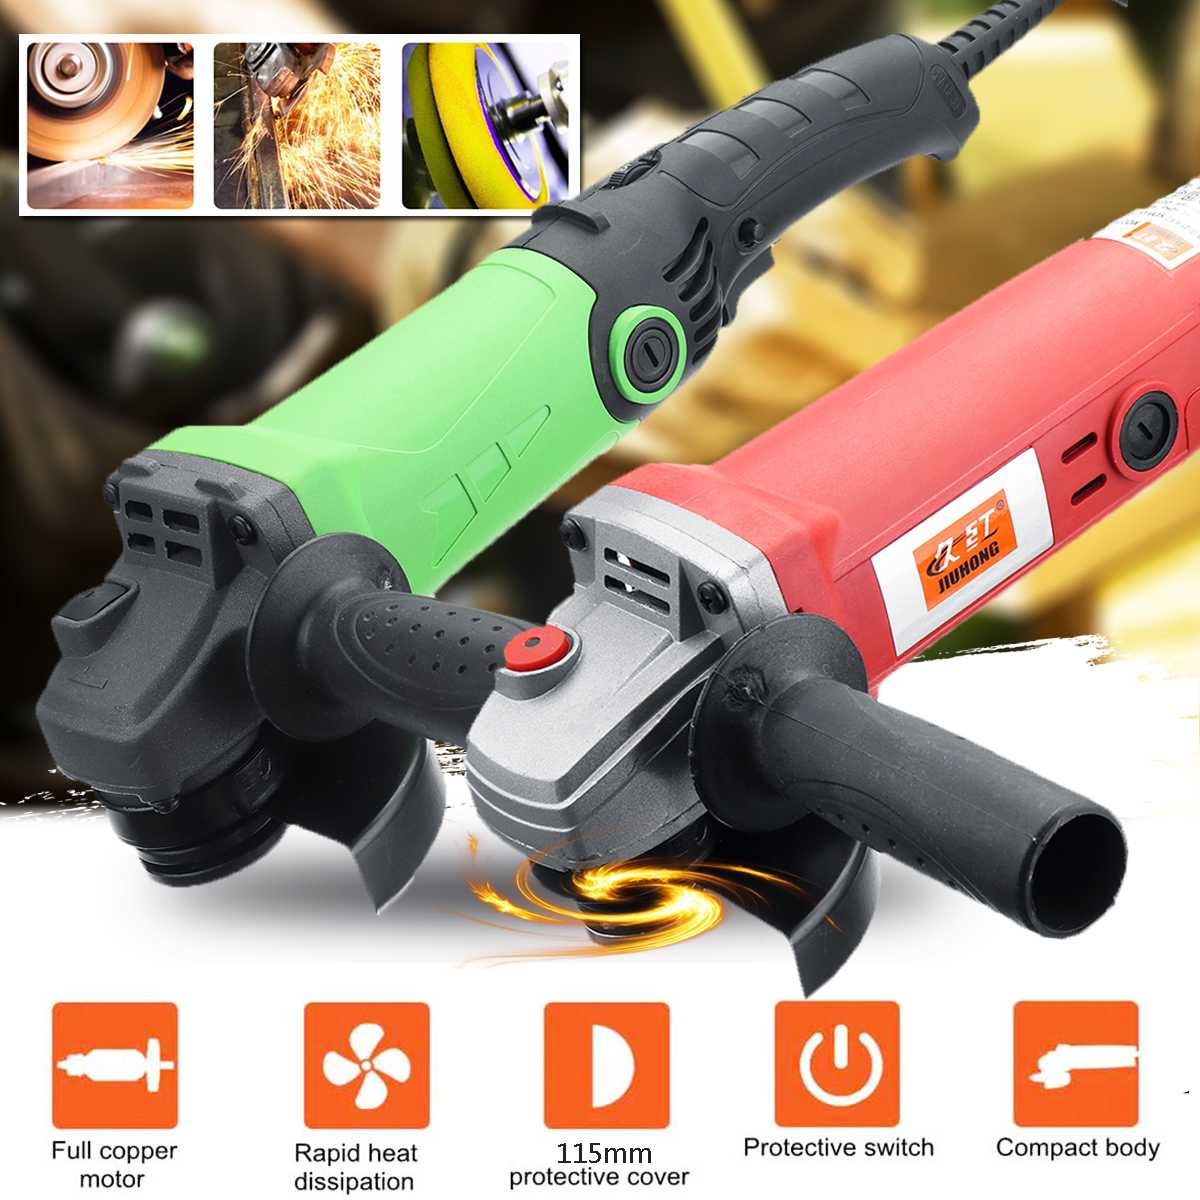 Electric Angle Grinder 1350/980W 115/100mm Adjustable Speed Metal Cutting Tool 220V EU Plug 360 Rotation Adjustable Anti slip